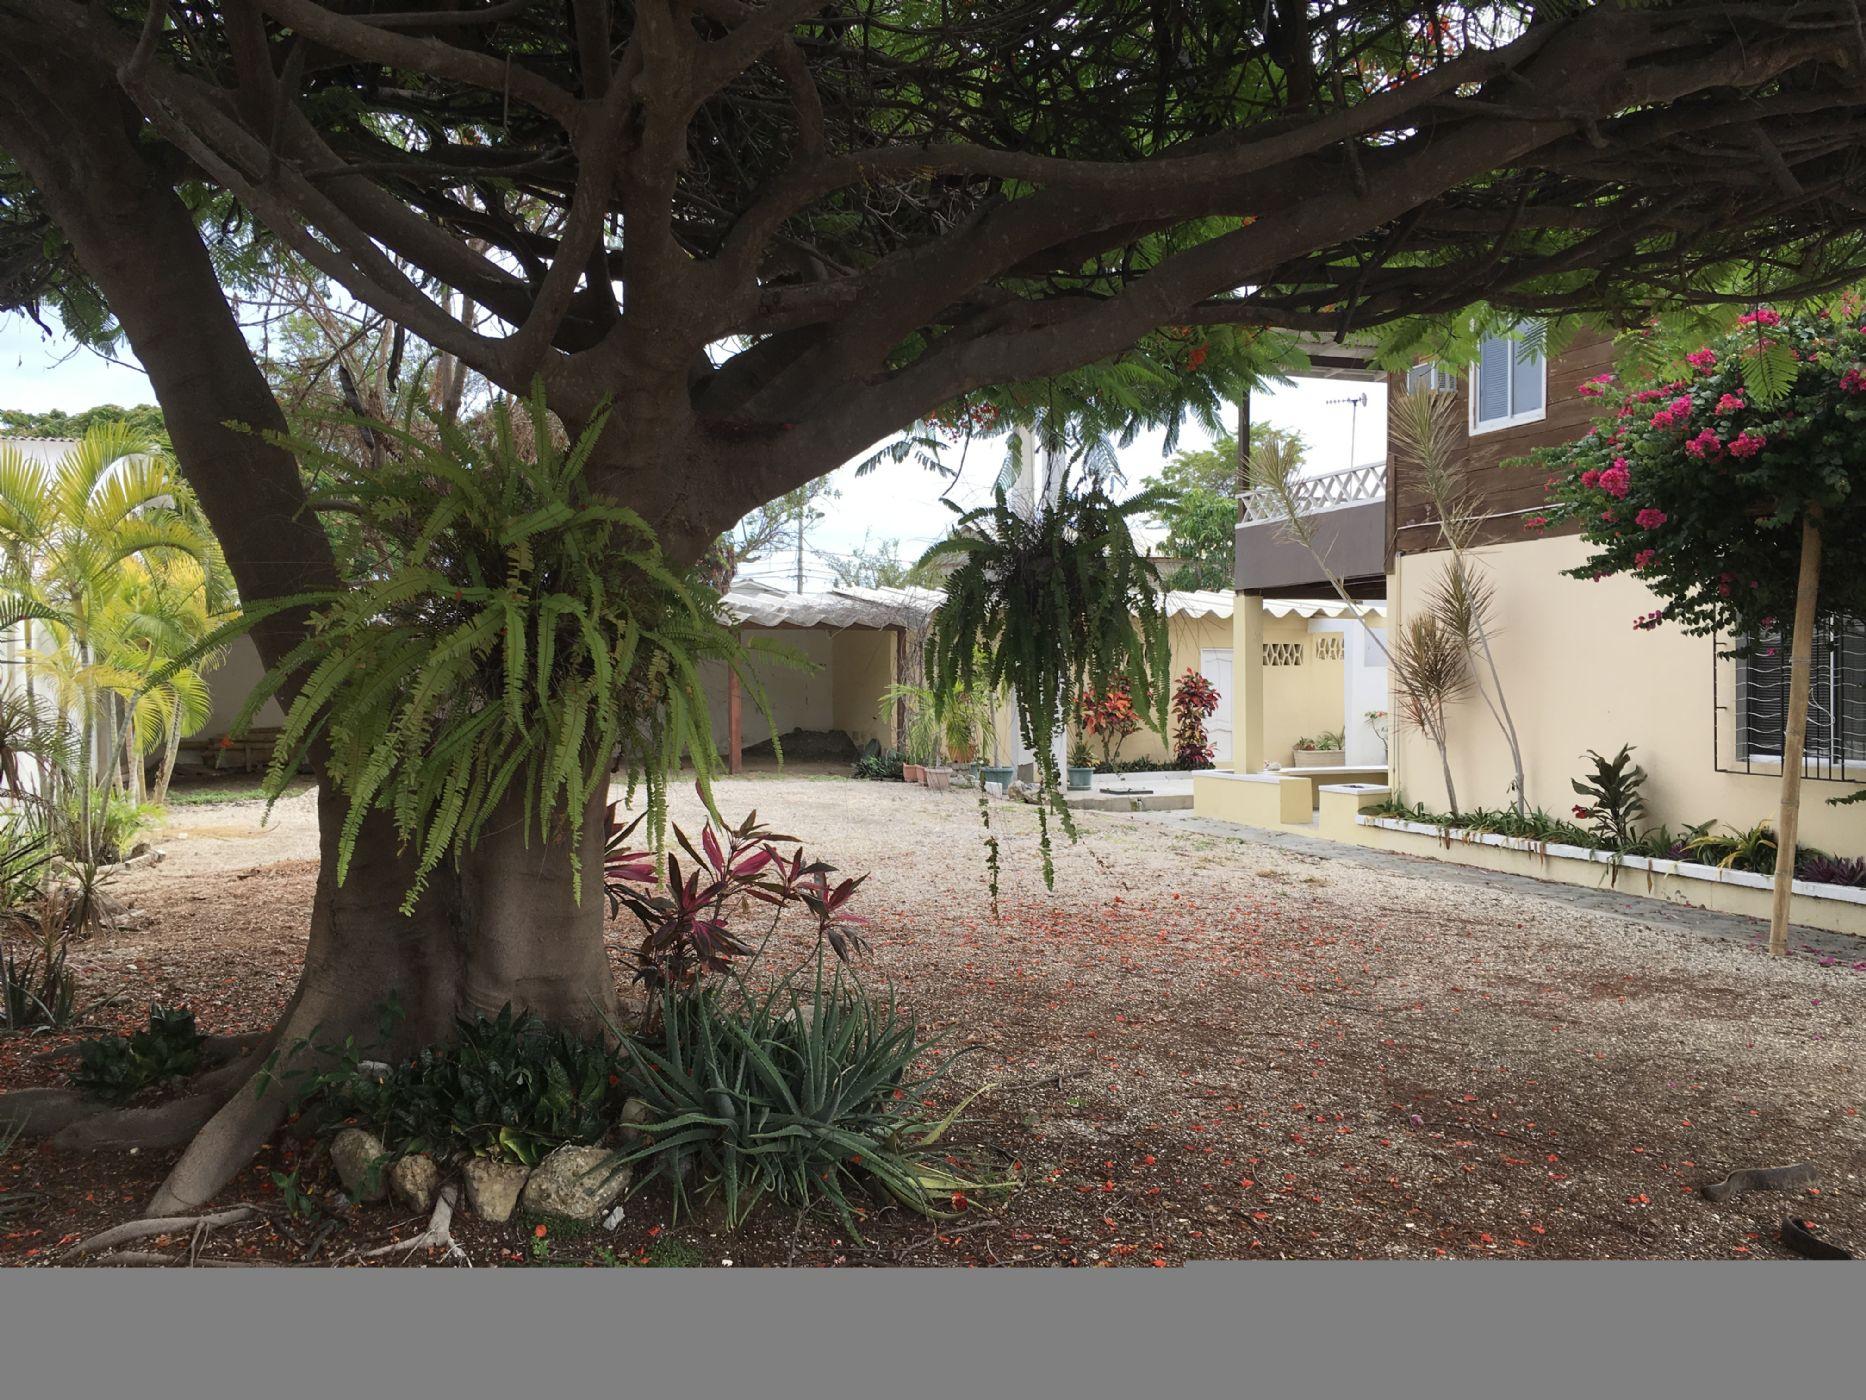 Salinas-Ecuador-property-500238.JPG